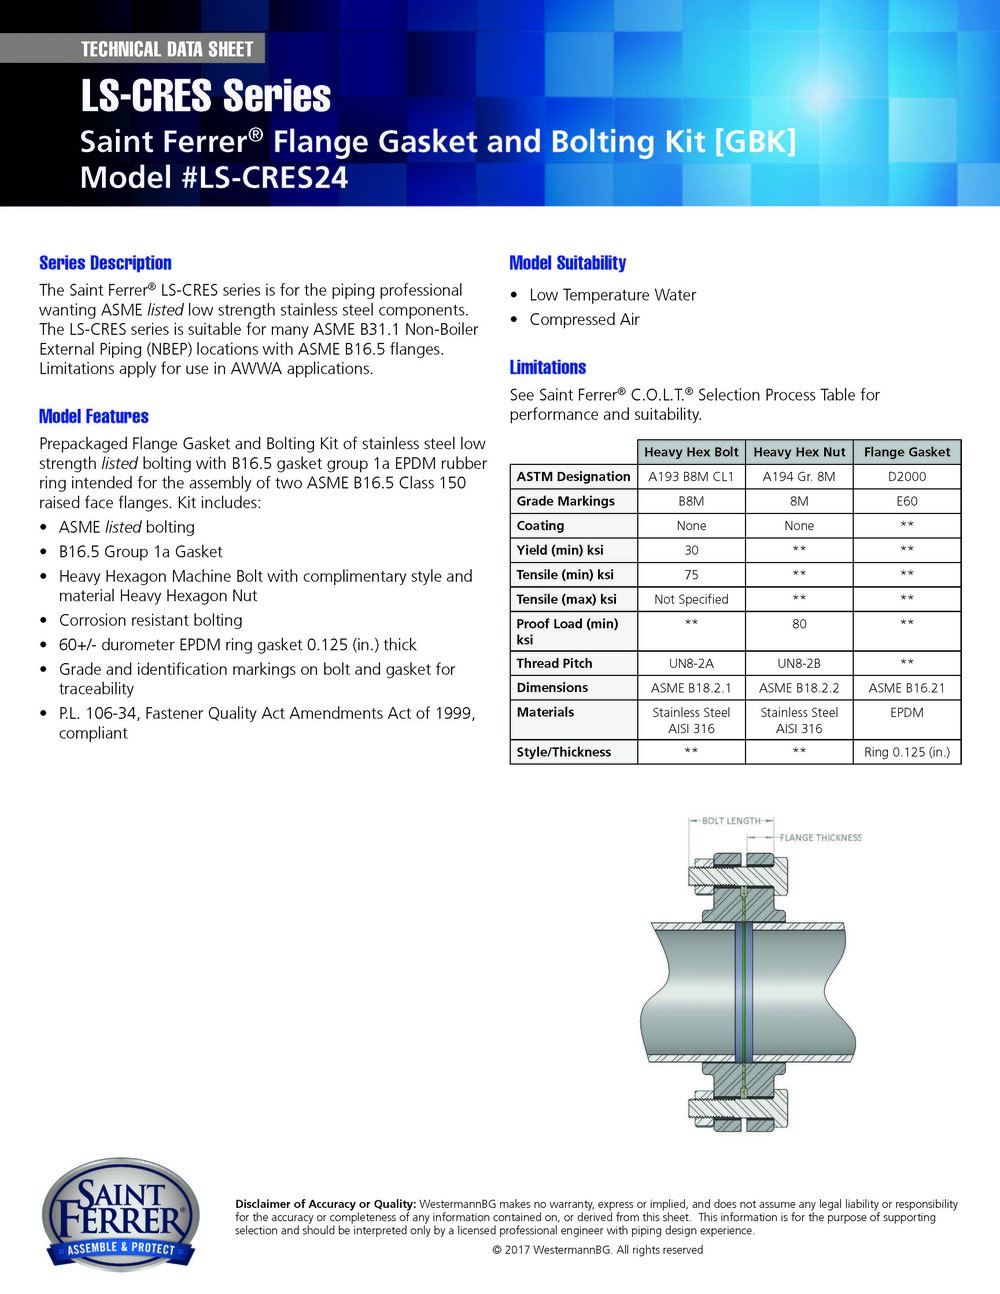 SF_Data_Sheet_LS-CRES_Series_LS-CRES24.jpg